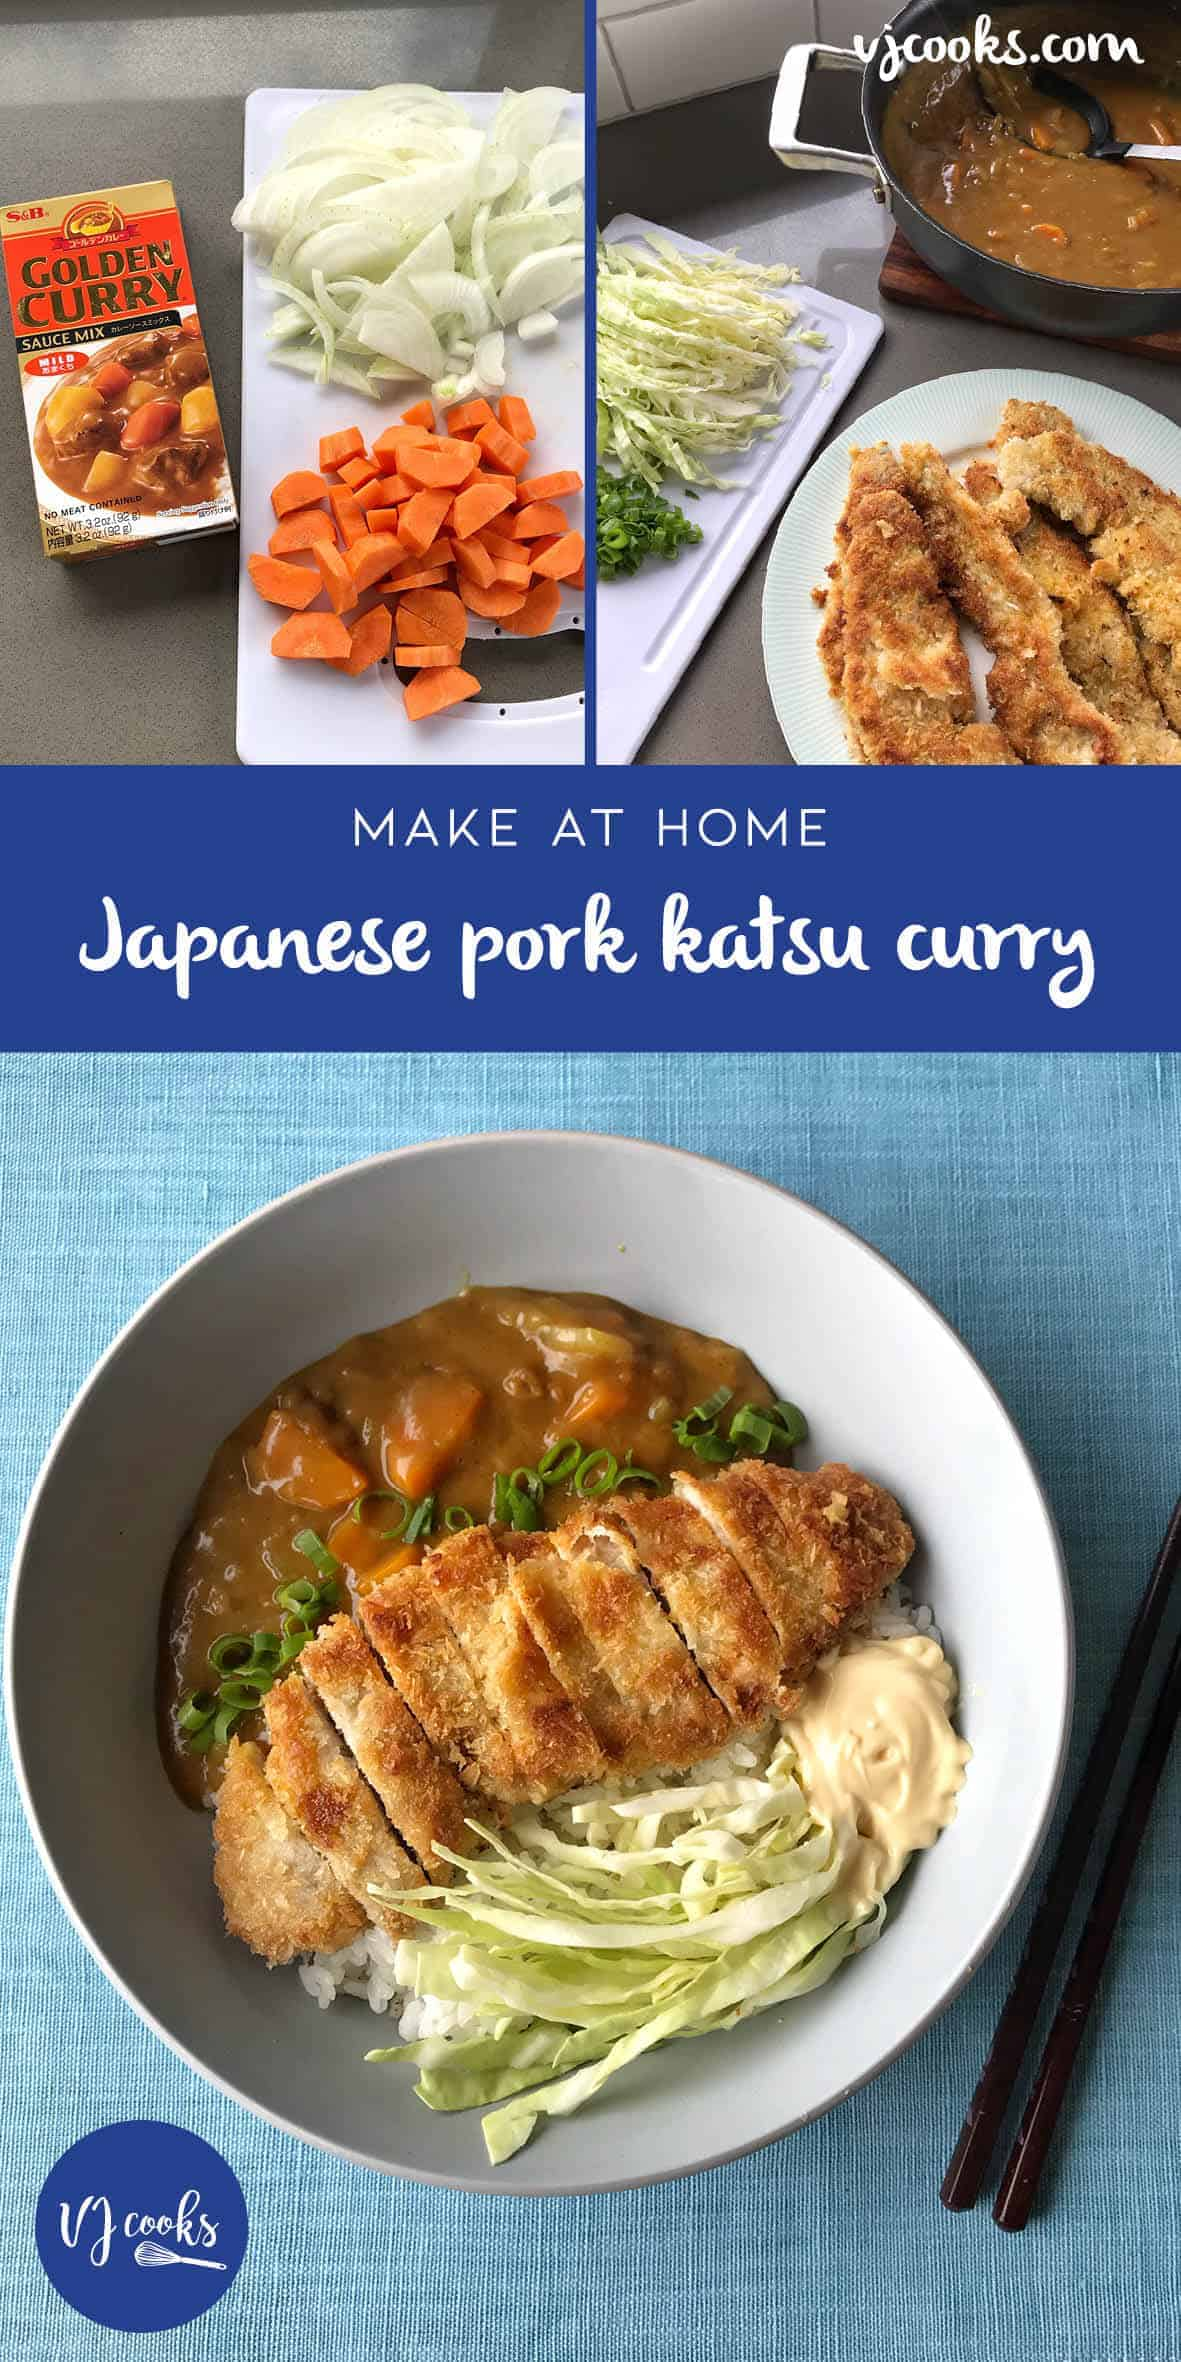 VJ cooks Japanese pork katsu curry